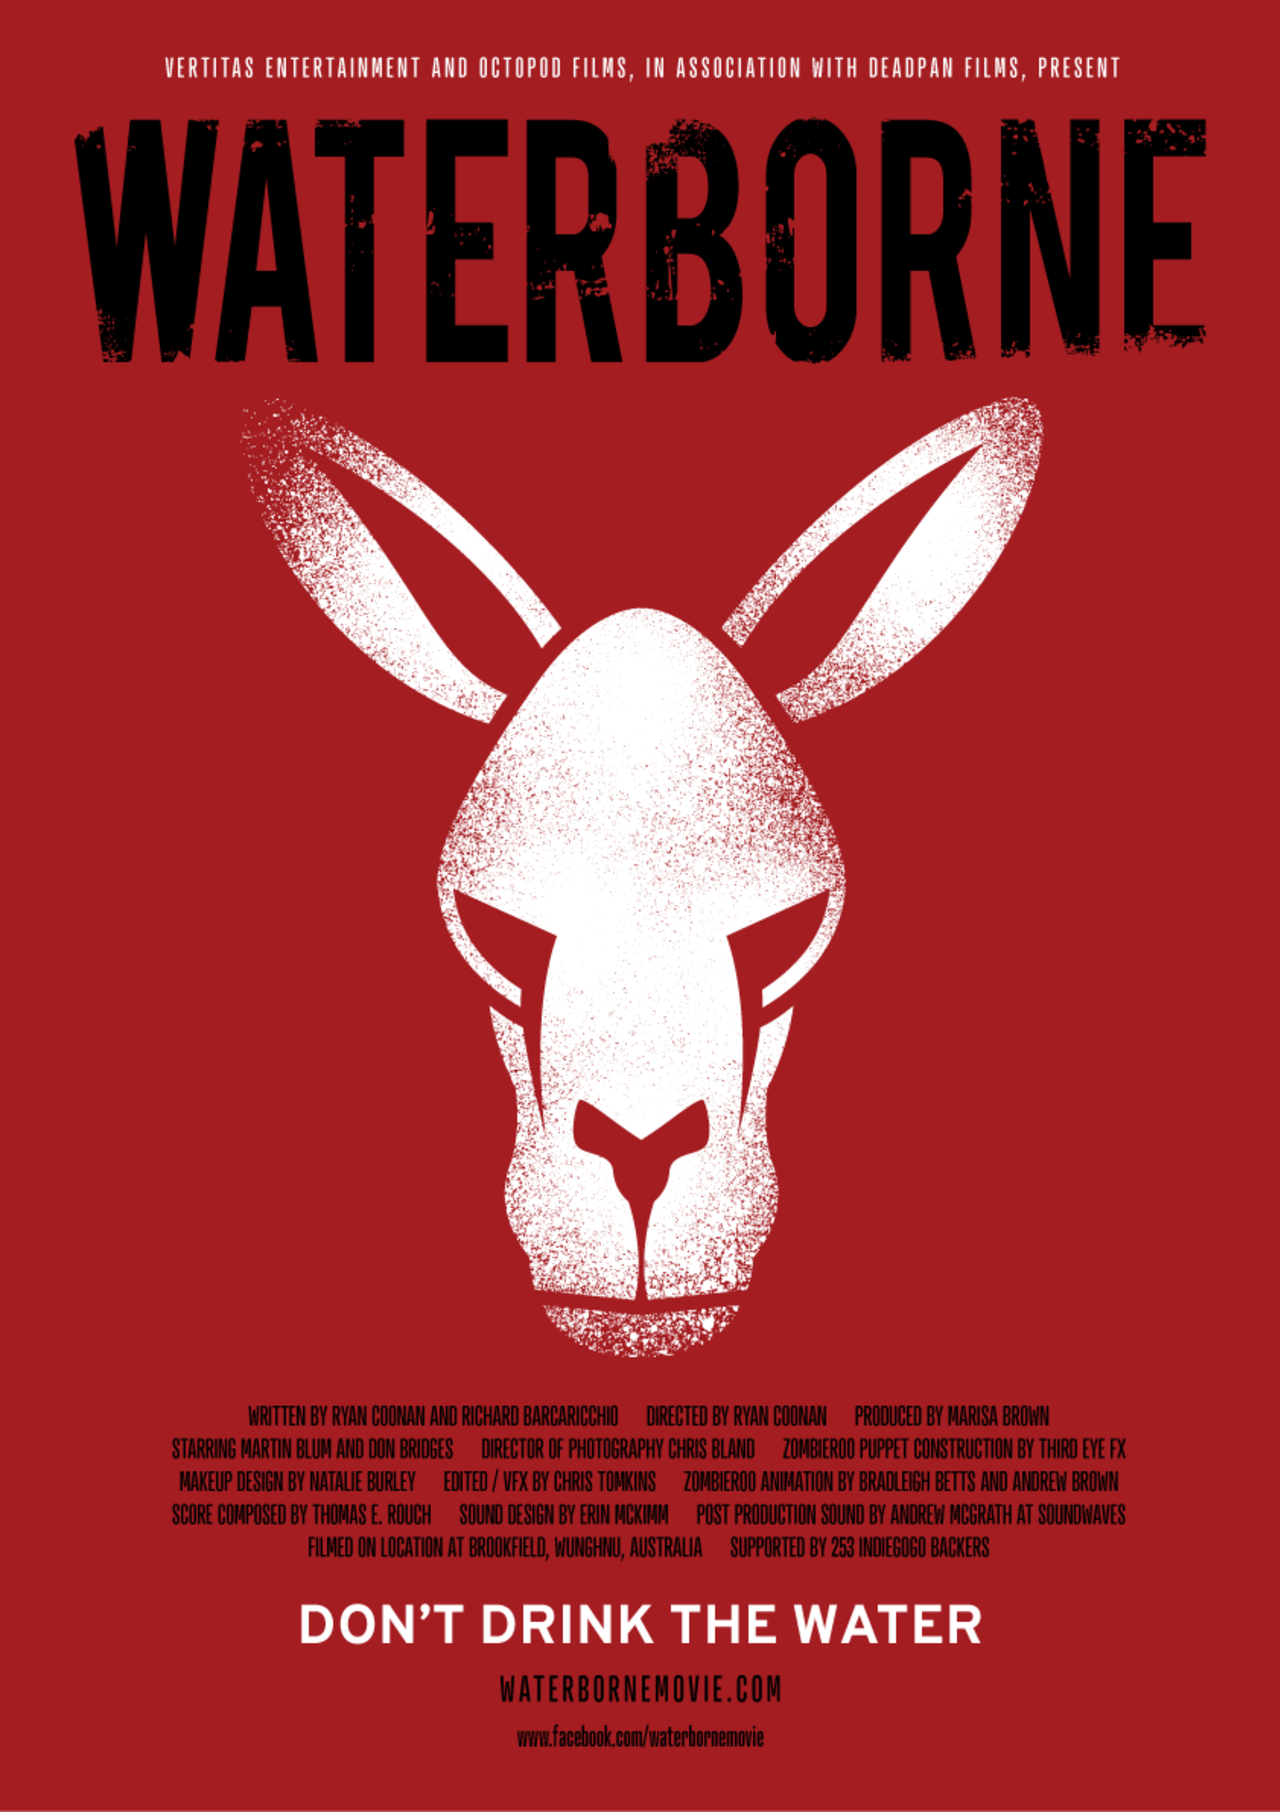 WATERBORNE, dir. Ryan Coonan (2014)